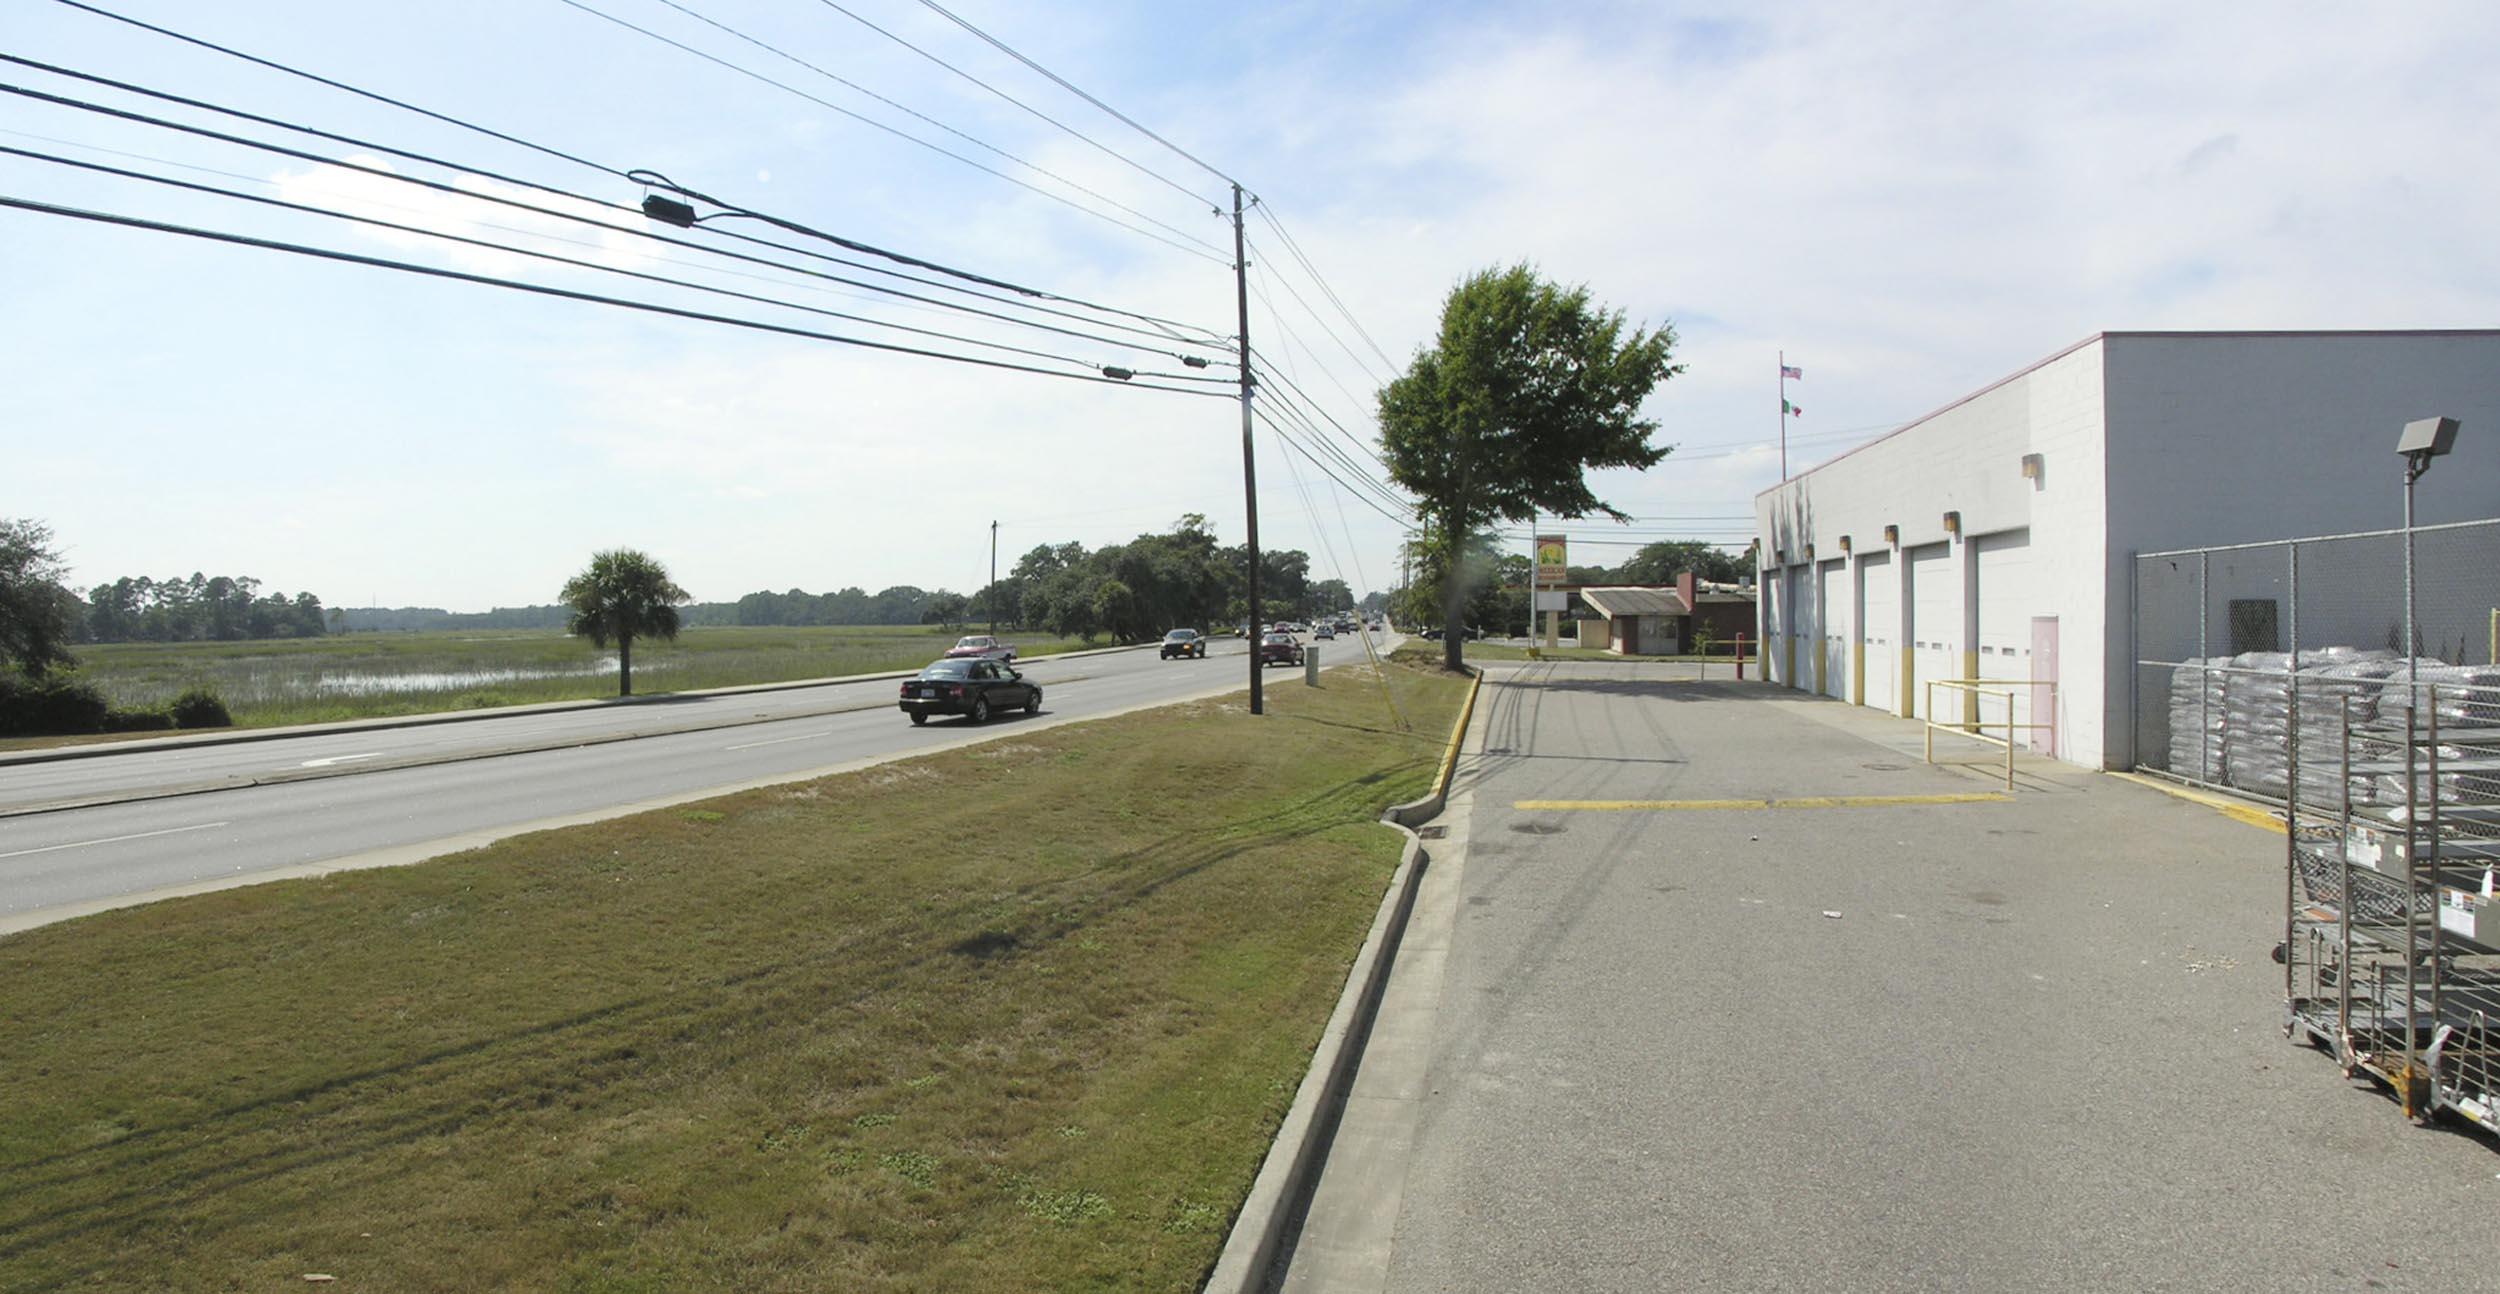 Boundary Street - existing (2005)